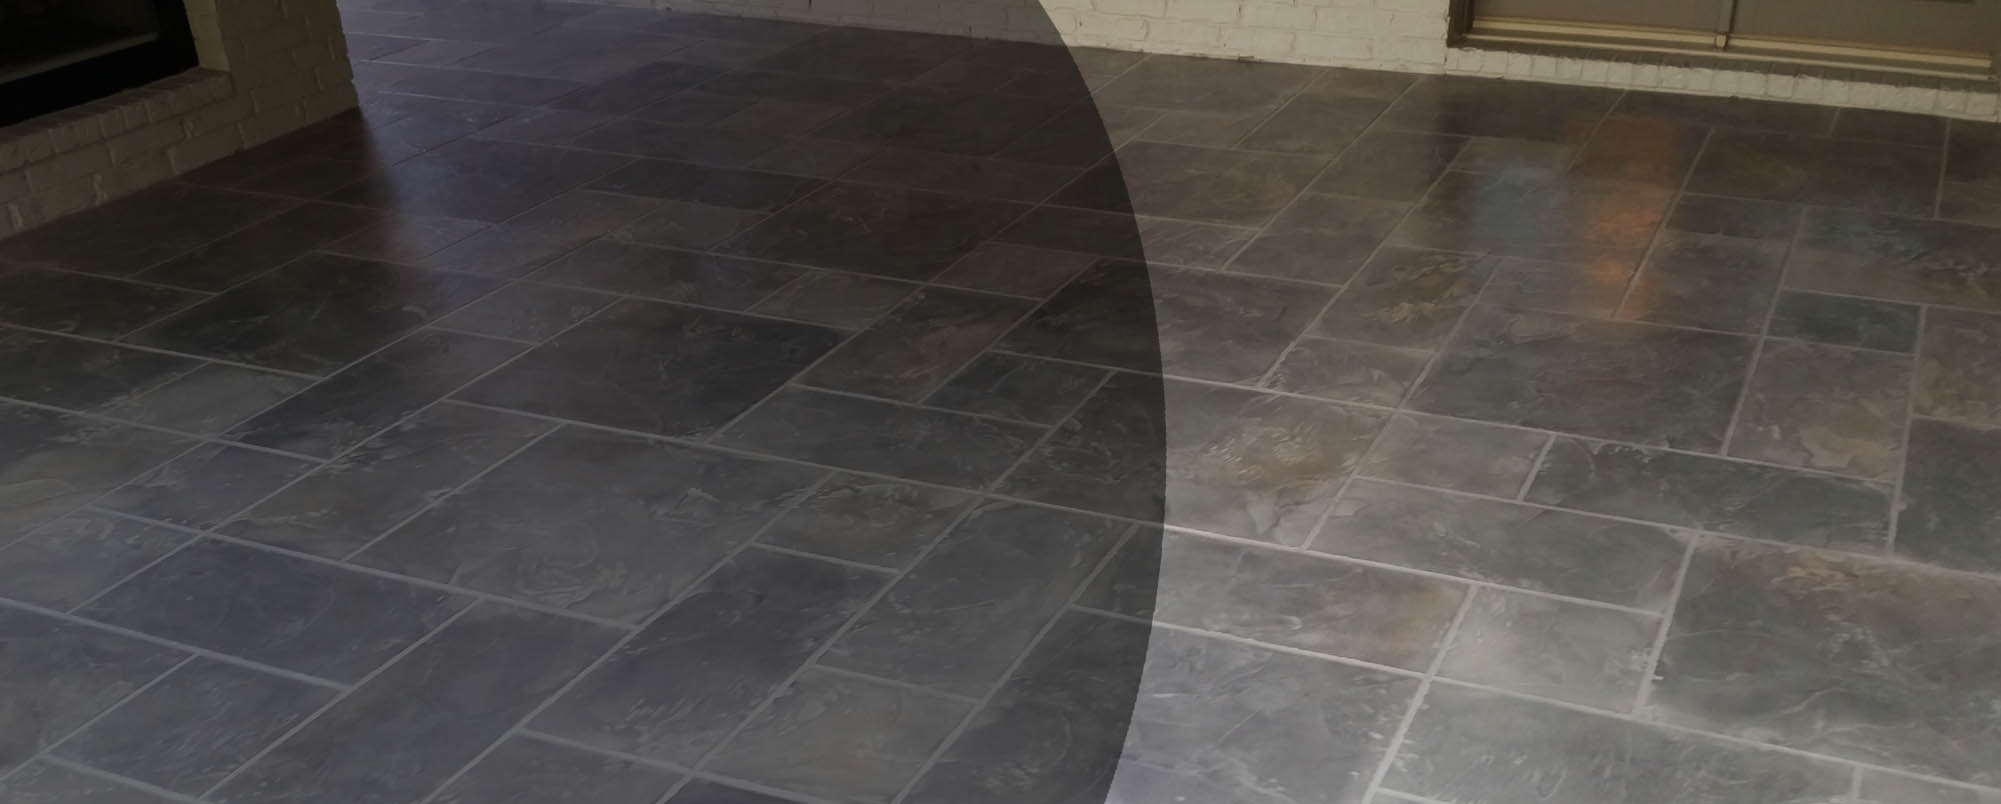 McKrete Concrete Overlay System